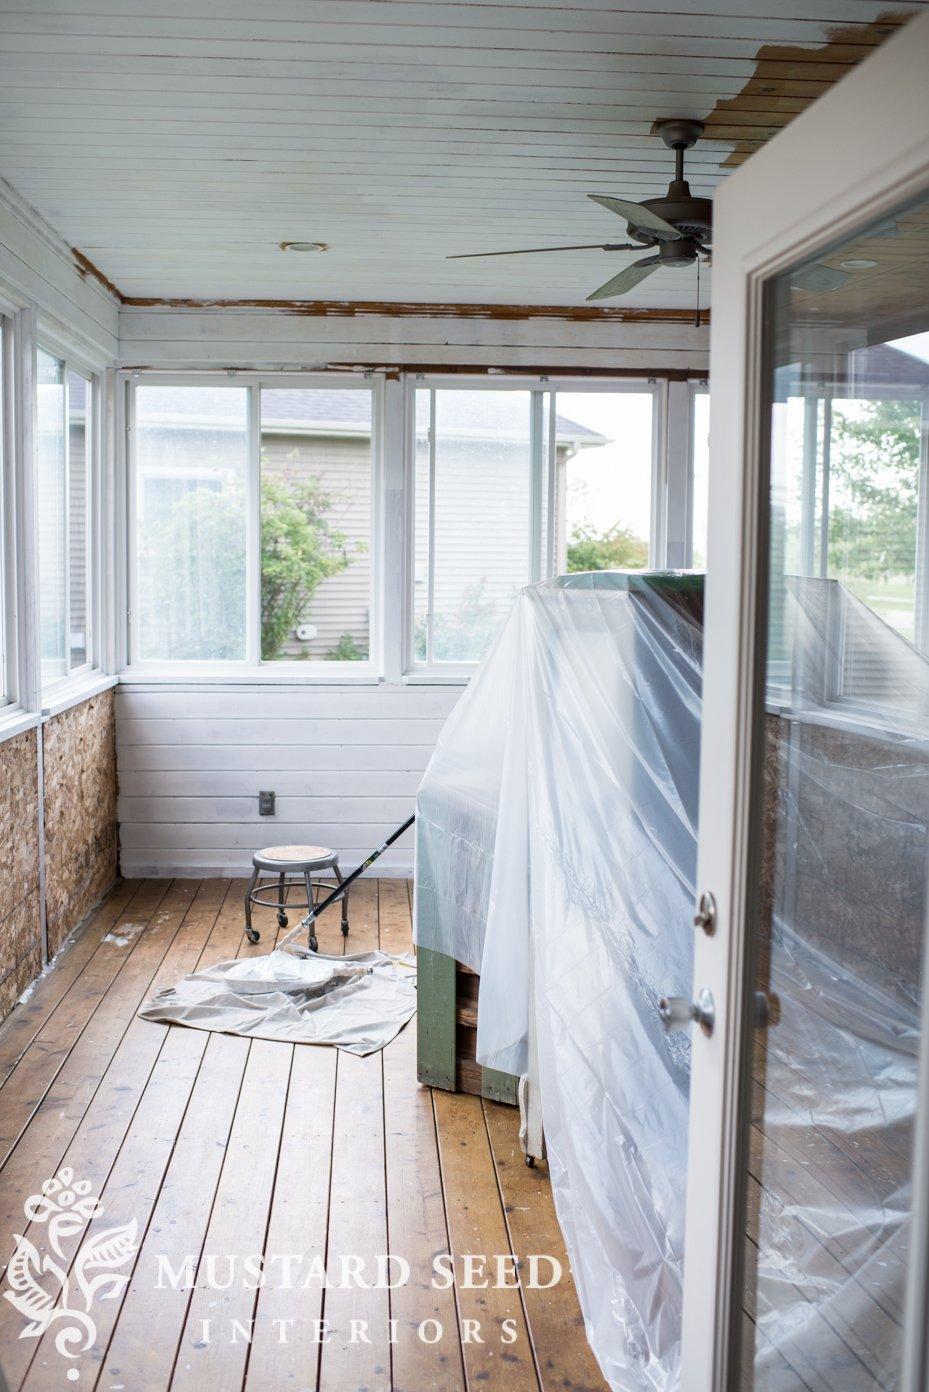 converting a sunroom into an art studio | miss mustard seed